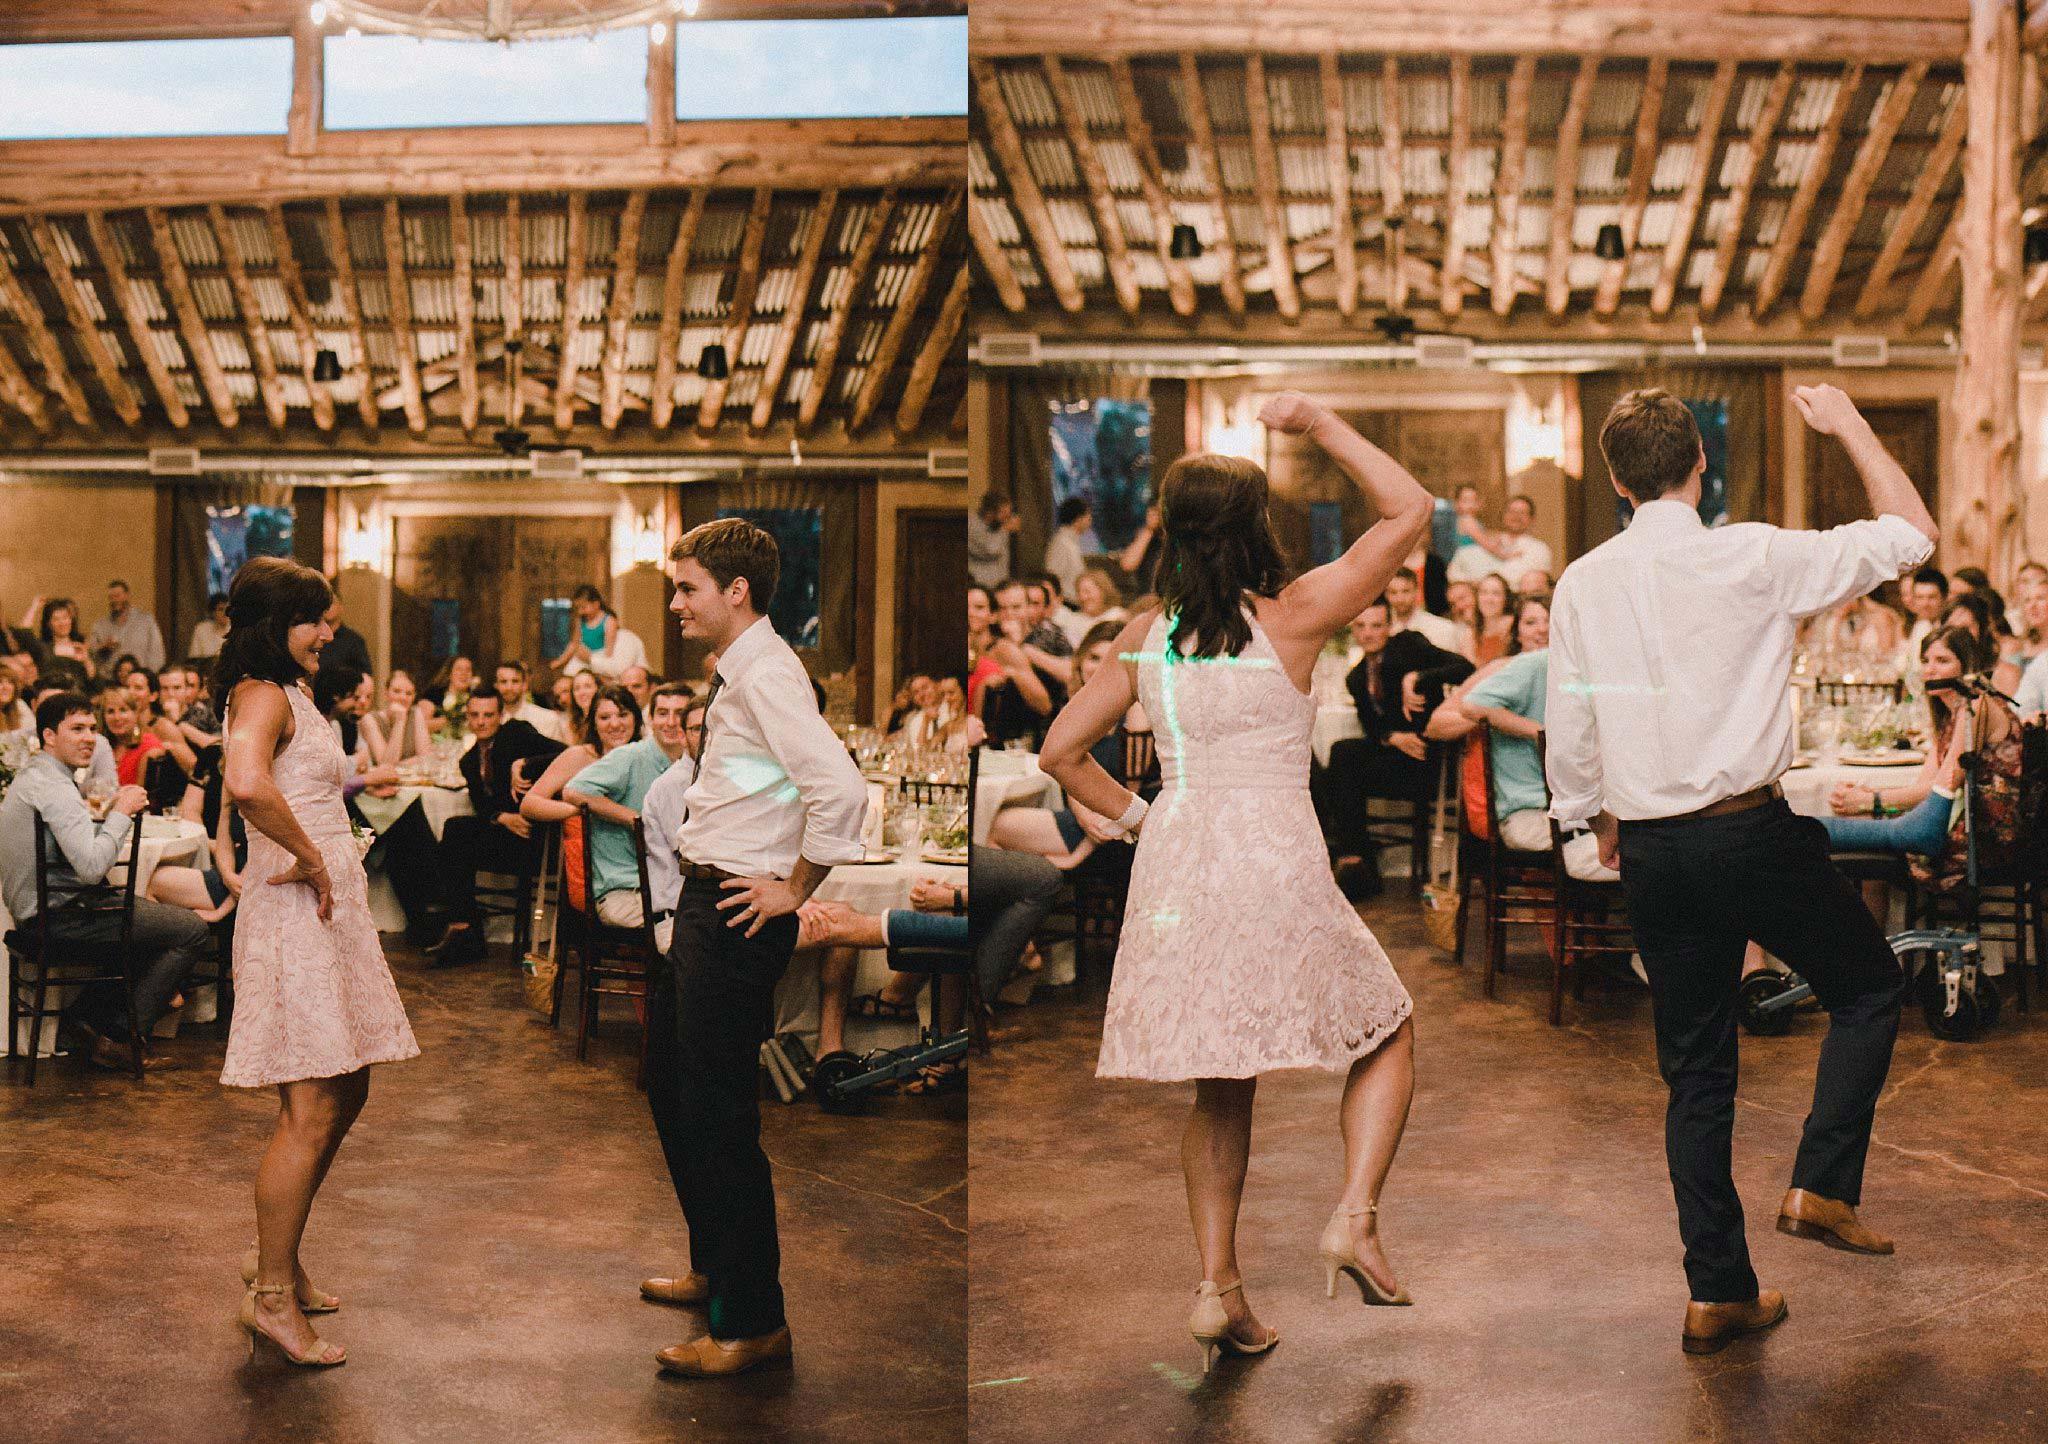 Groom and mom dancing at rustic wedding venue